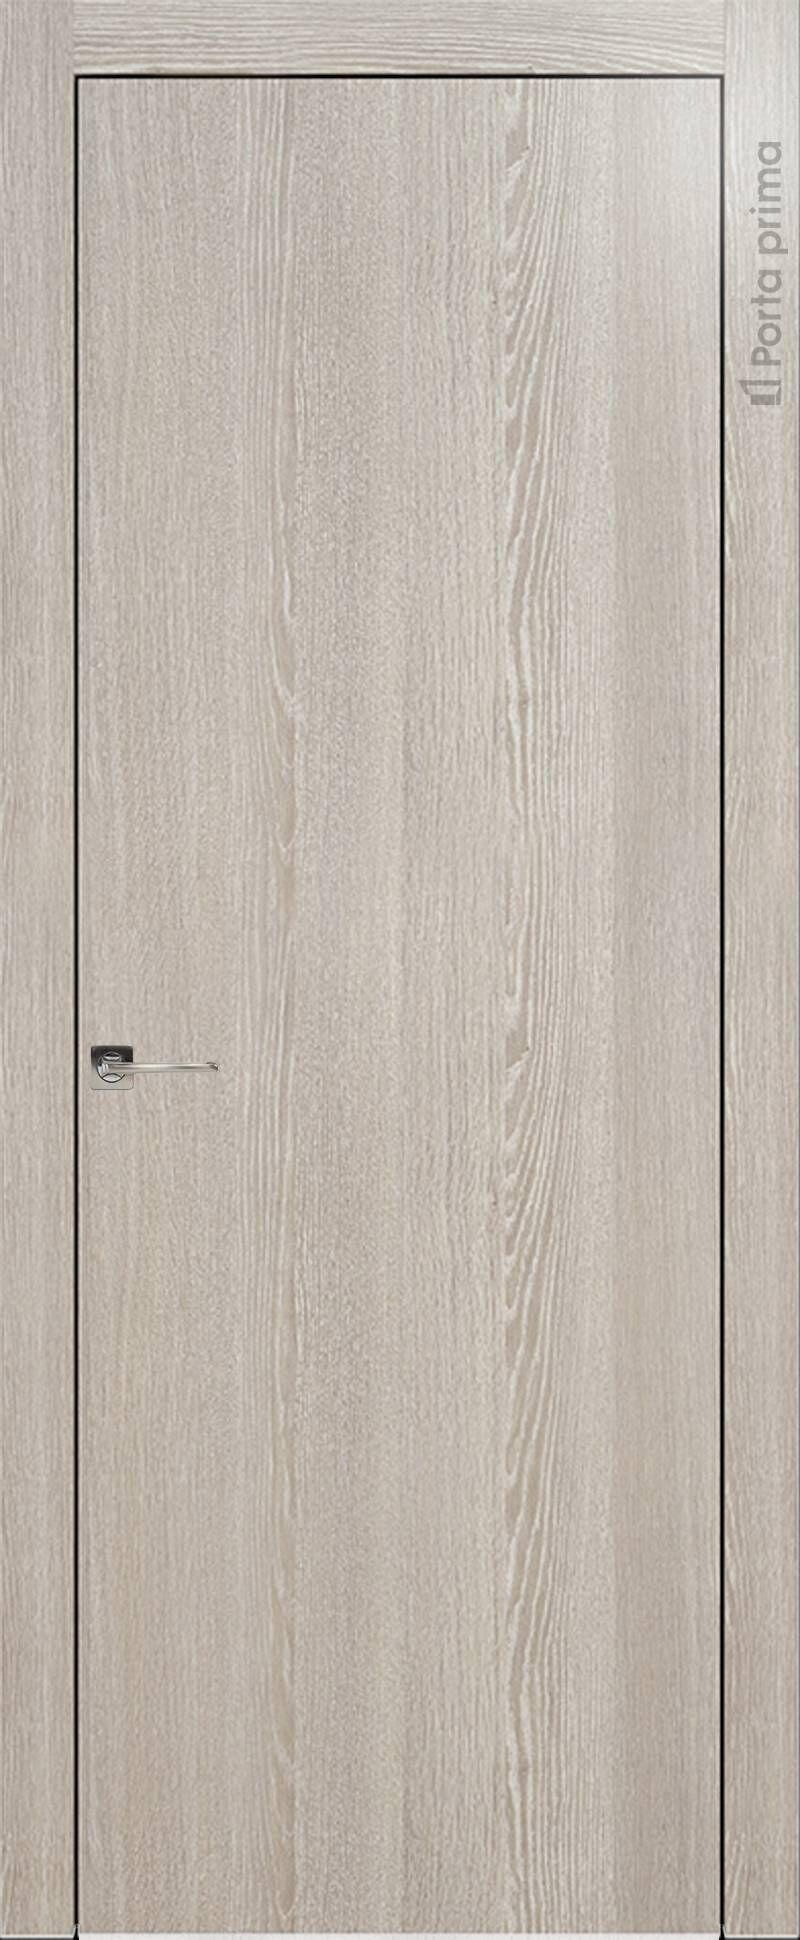 Tivoli А-1 Книжка цвет - Серый дуб Без стекла (ДГ)